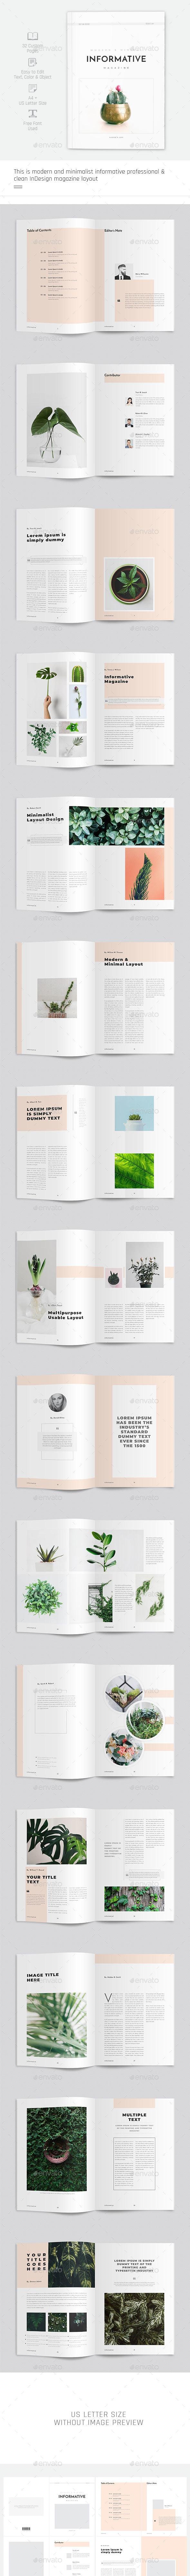 Minimal Informative Magazine - Magazines Print Templates